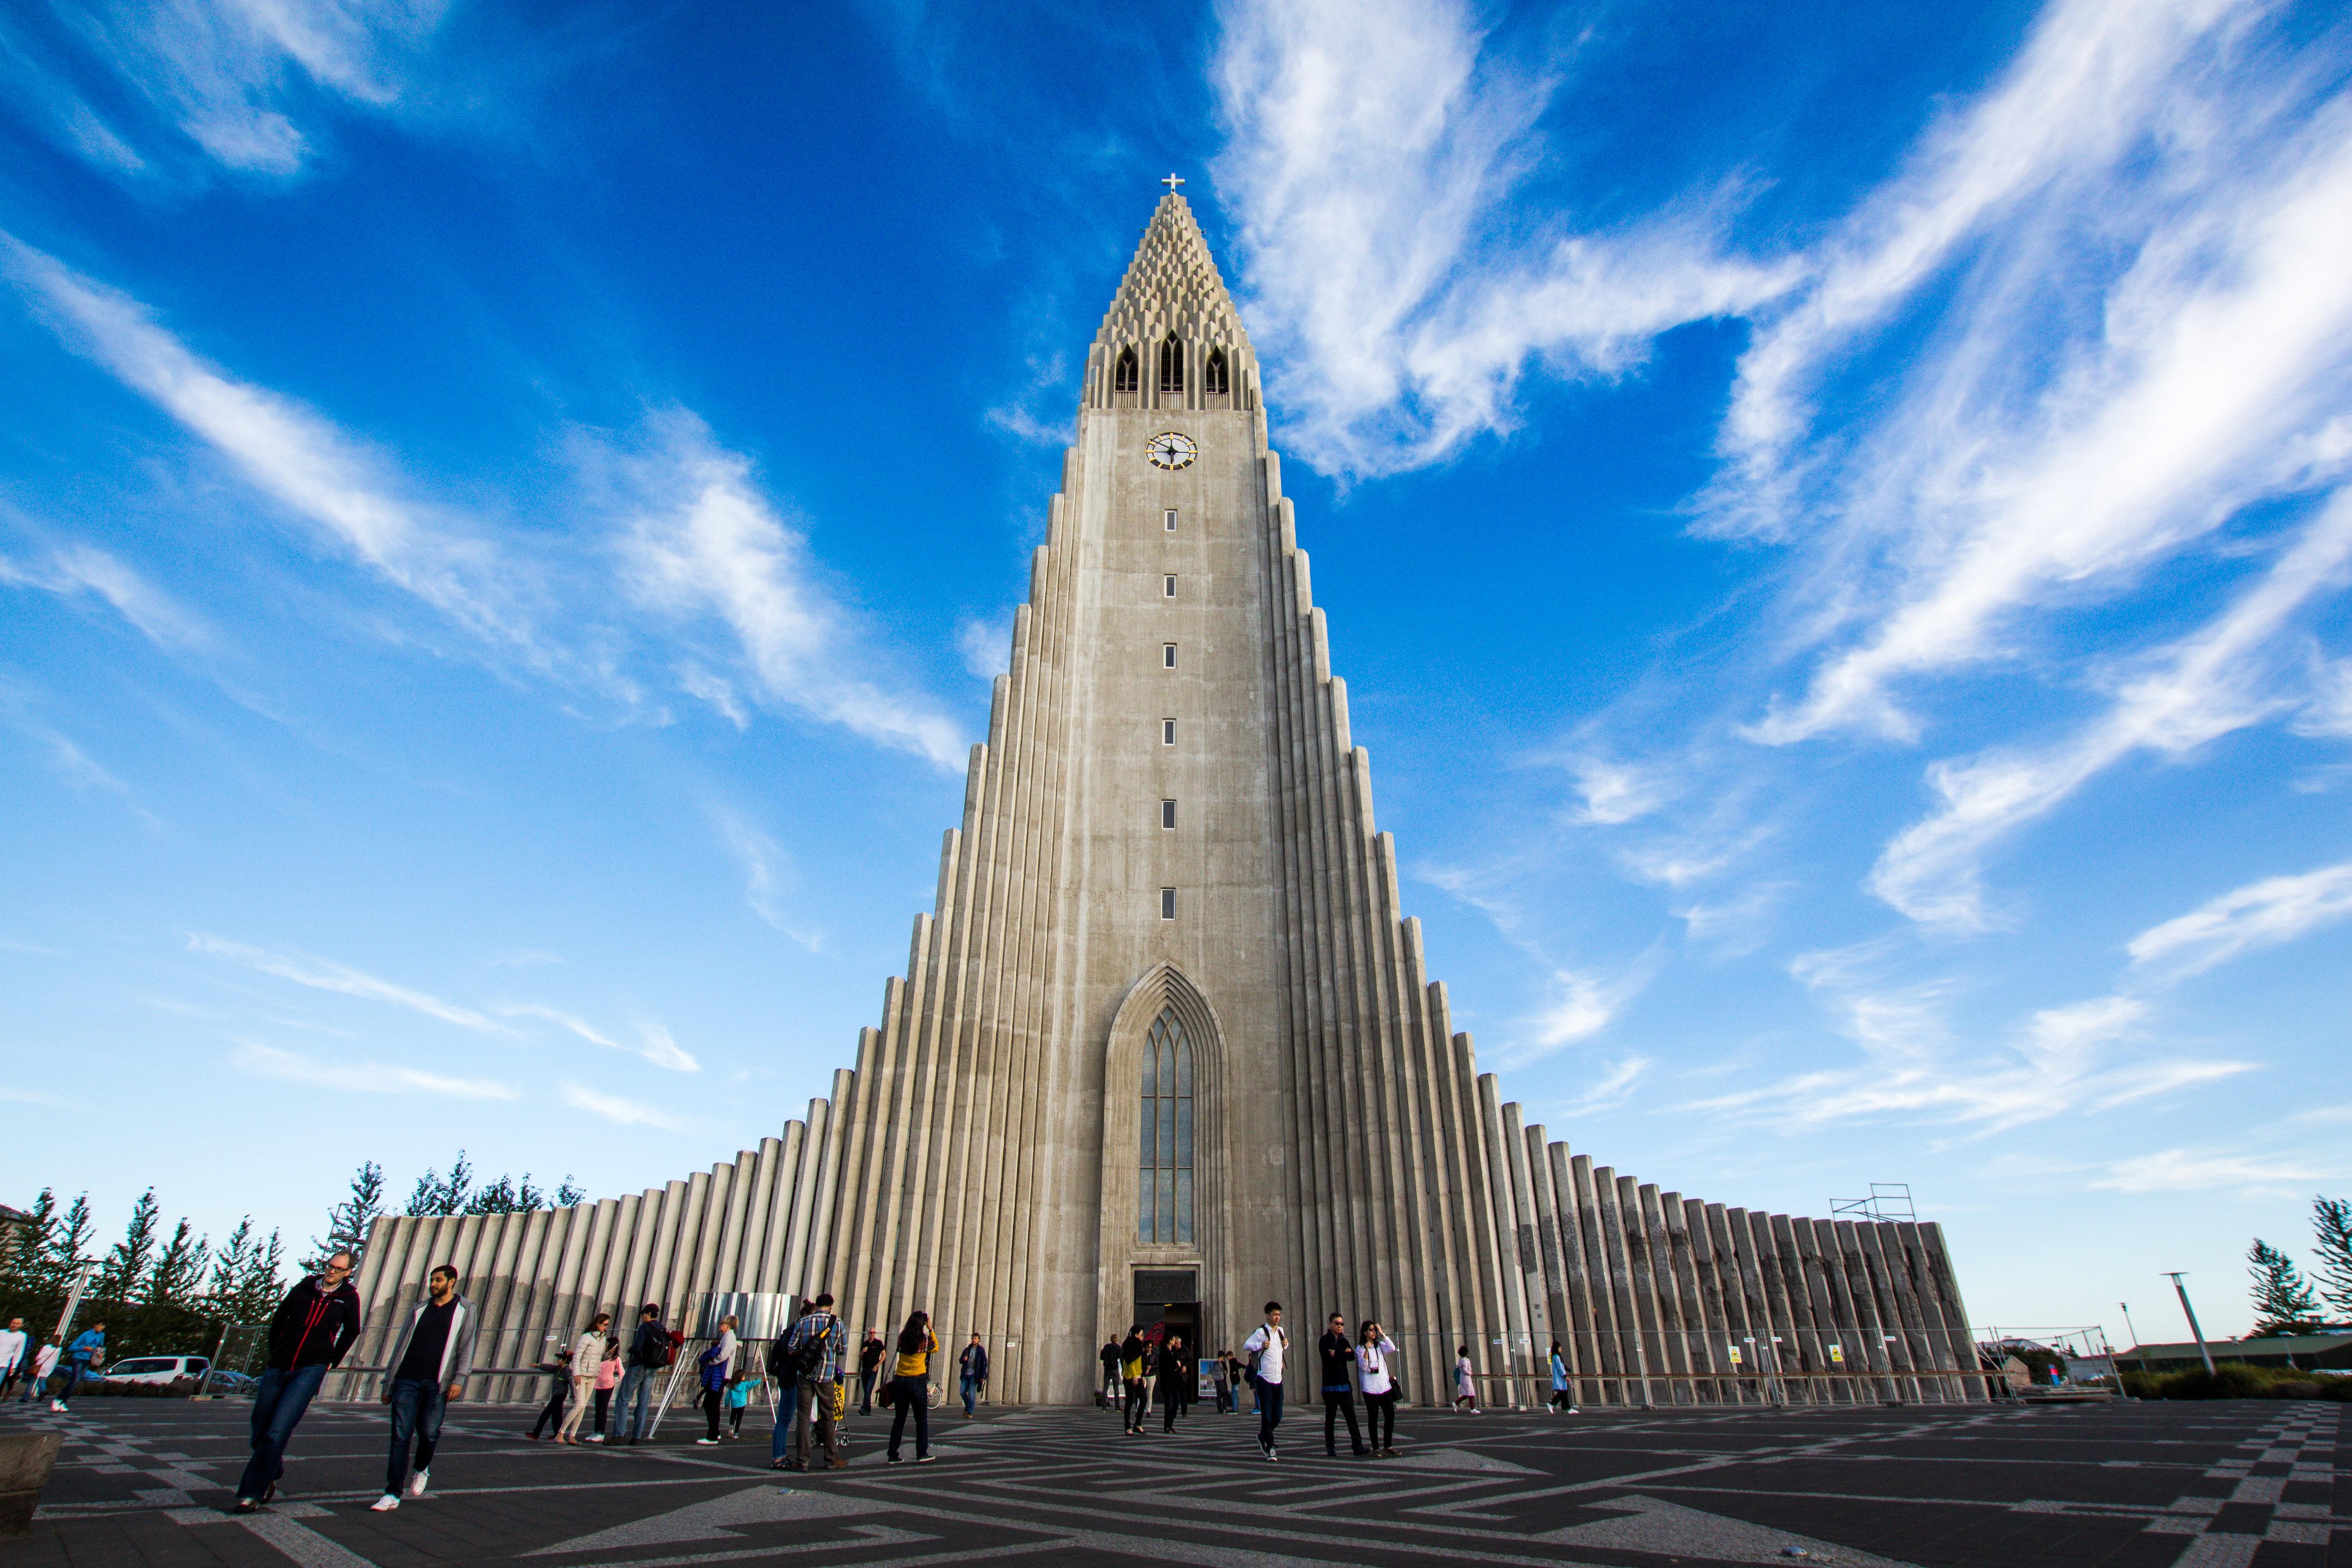 hallgrimskirkja church in Iceland Things to do in Reykjavik